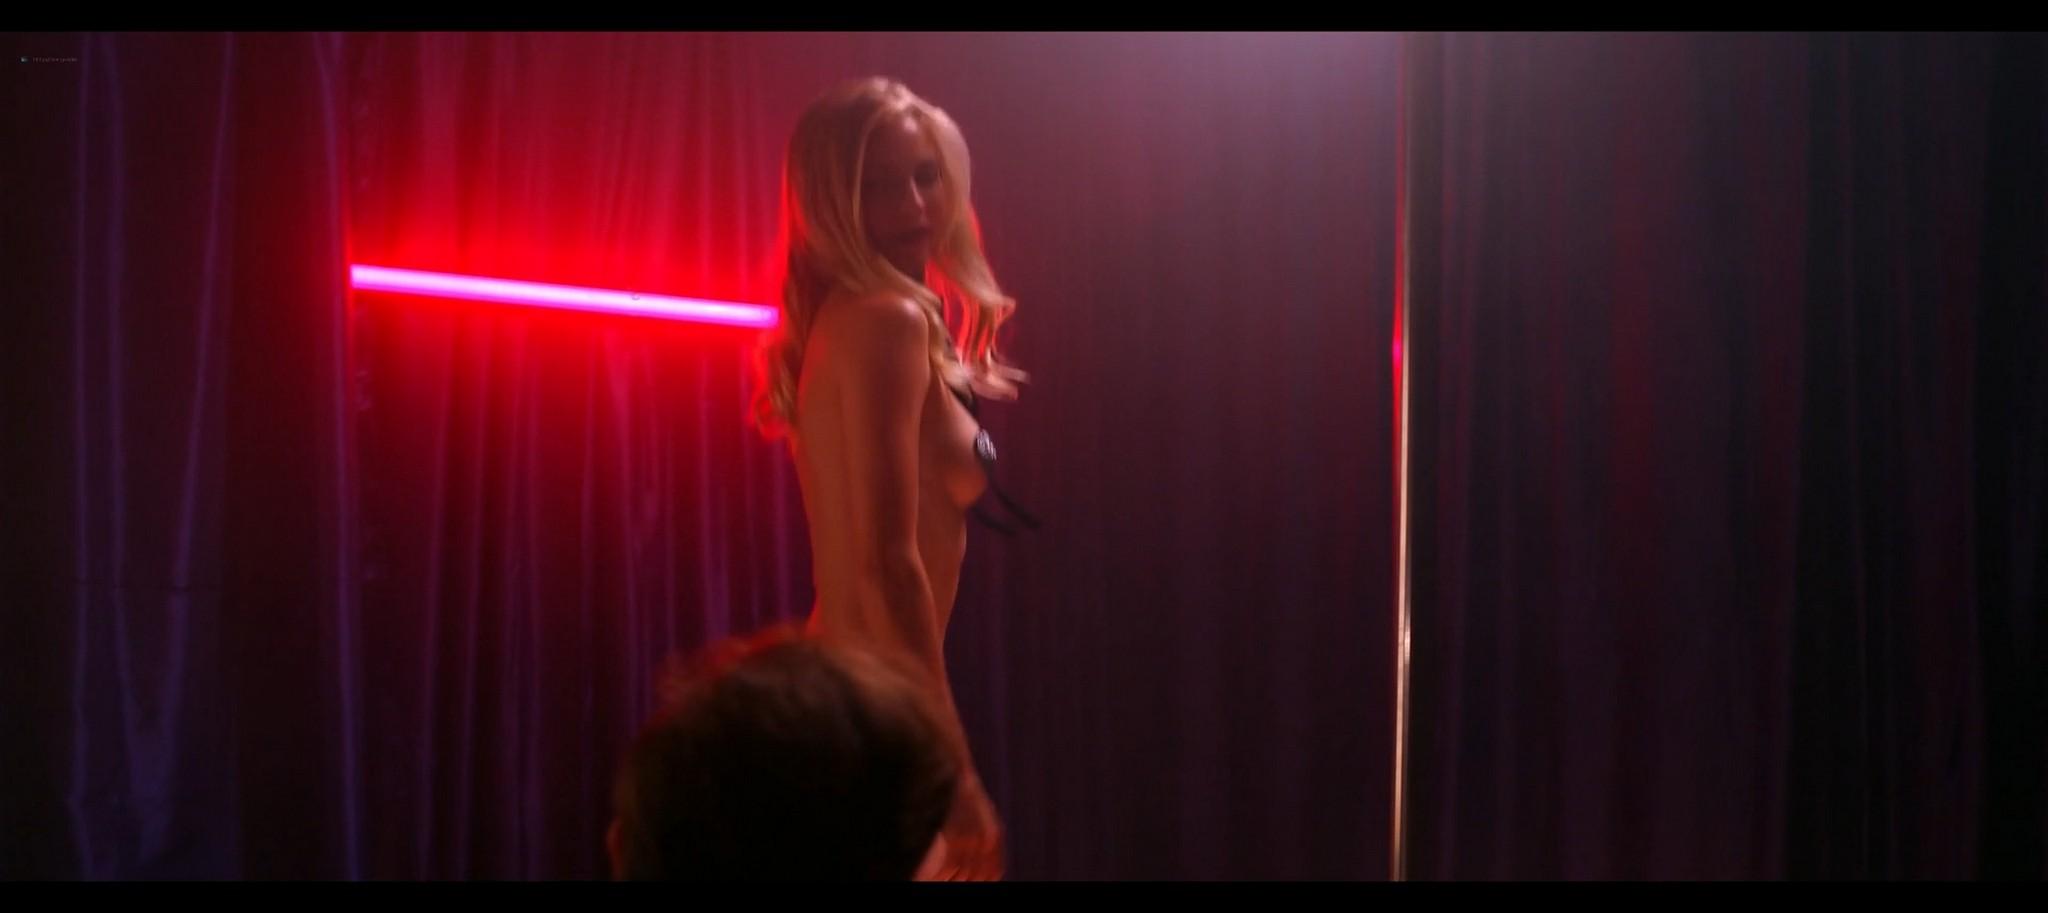 Kenzie Dalton hot Drue Knapp Ava Locklear sexy A Dark Foe 2021 1080p Web 10